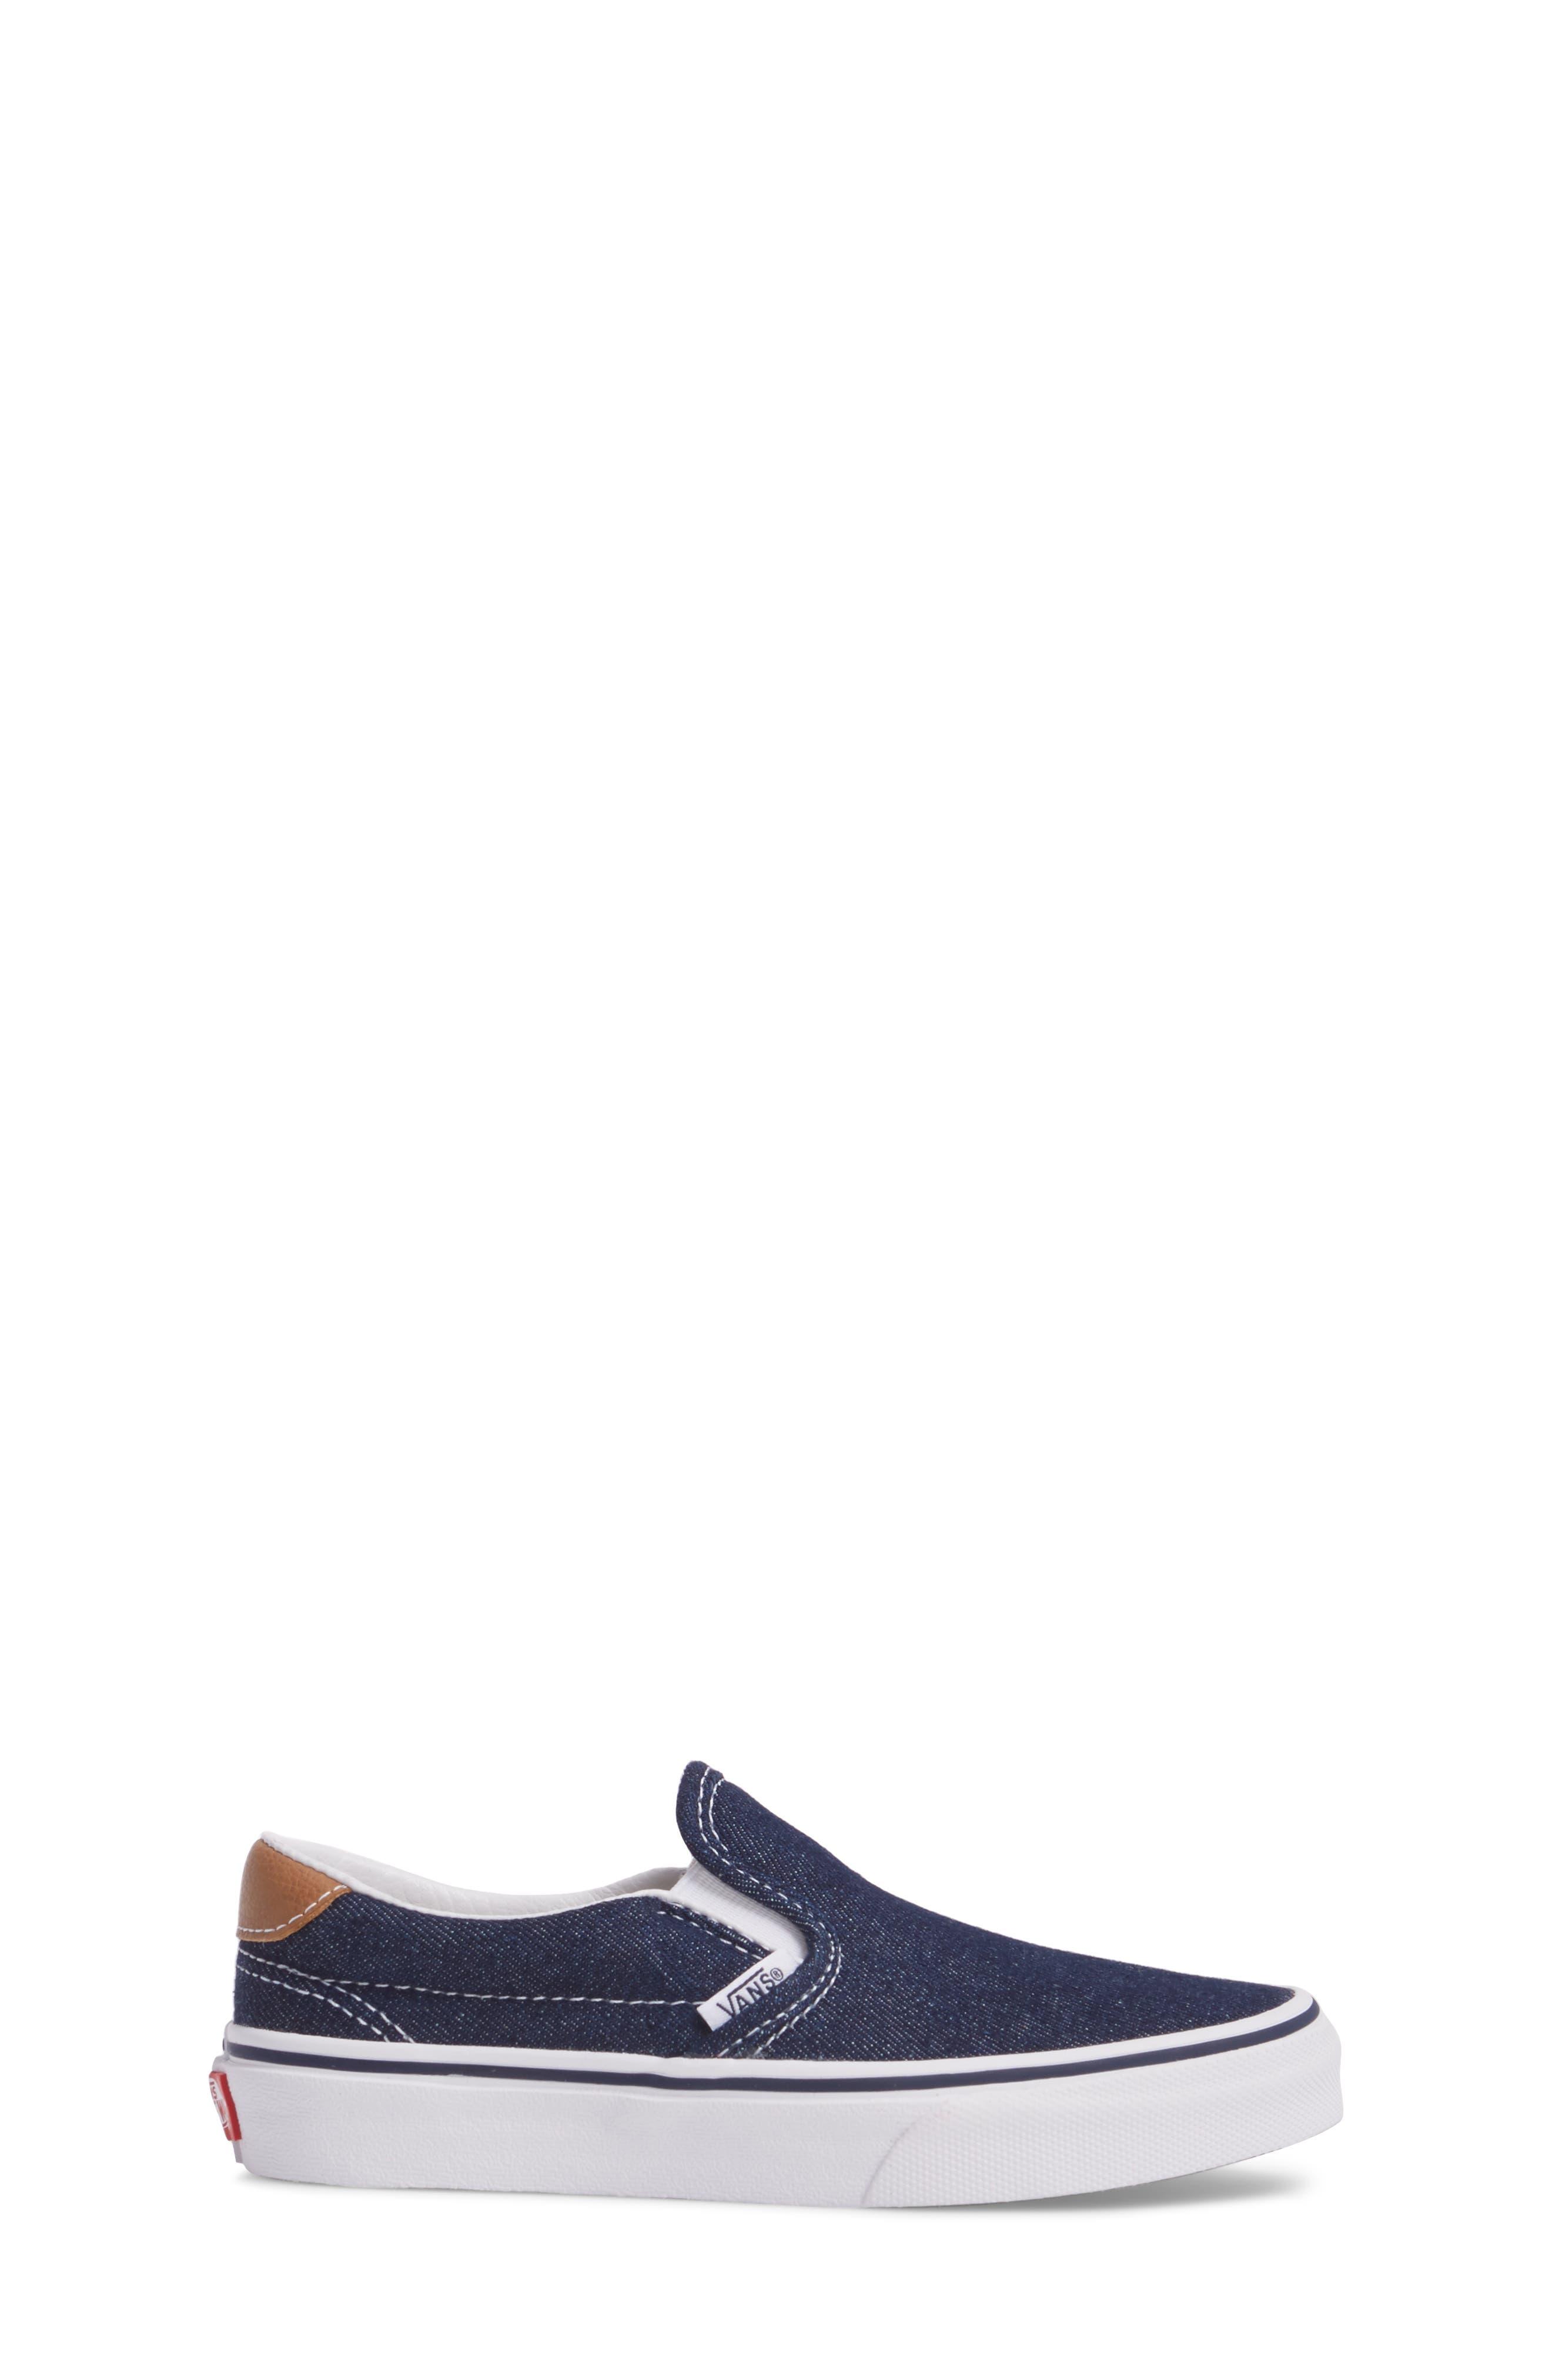 Denim C&L Slip-On 59 Sneaker,                             Alternate thumbnail 3, color,                             Denim Dress Blues/ Chipmunk